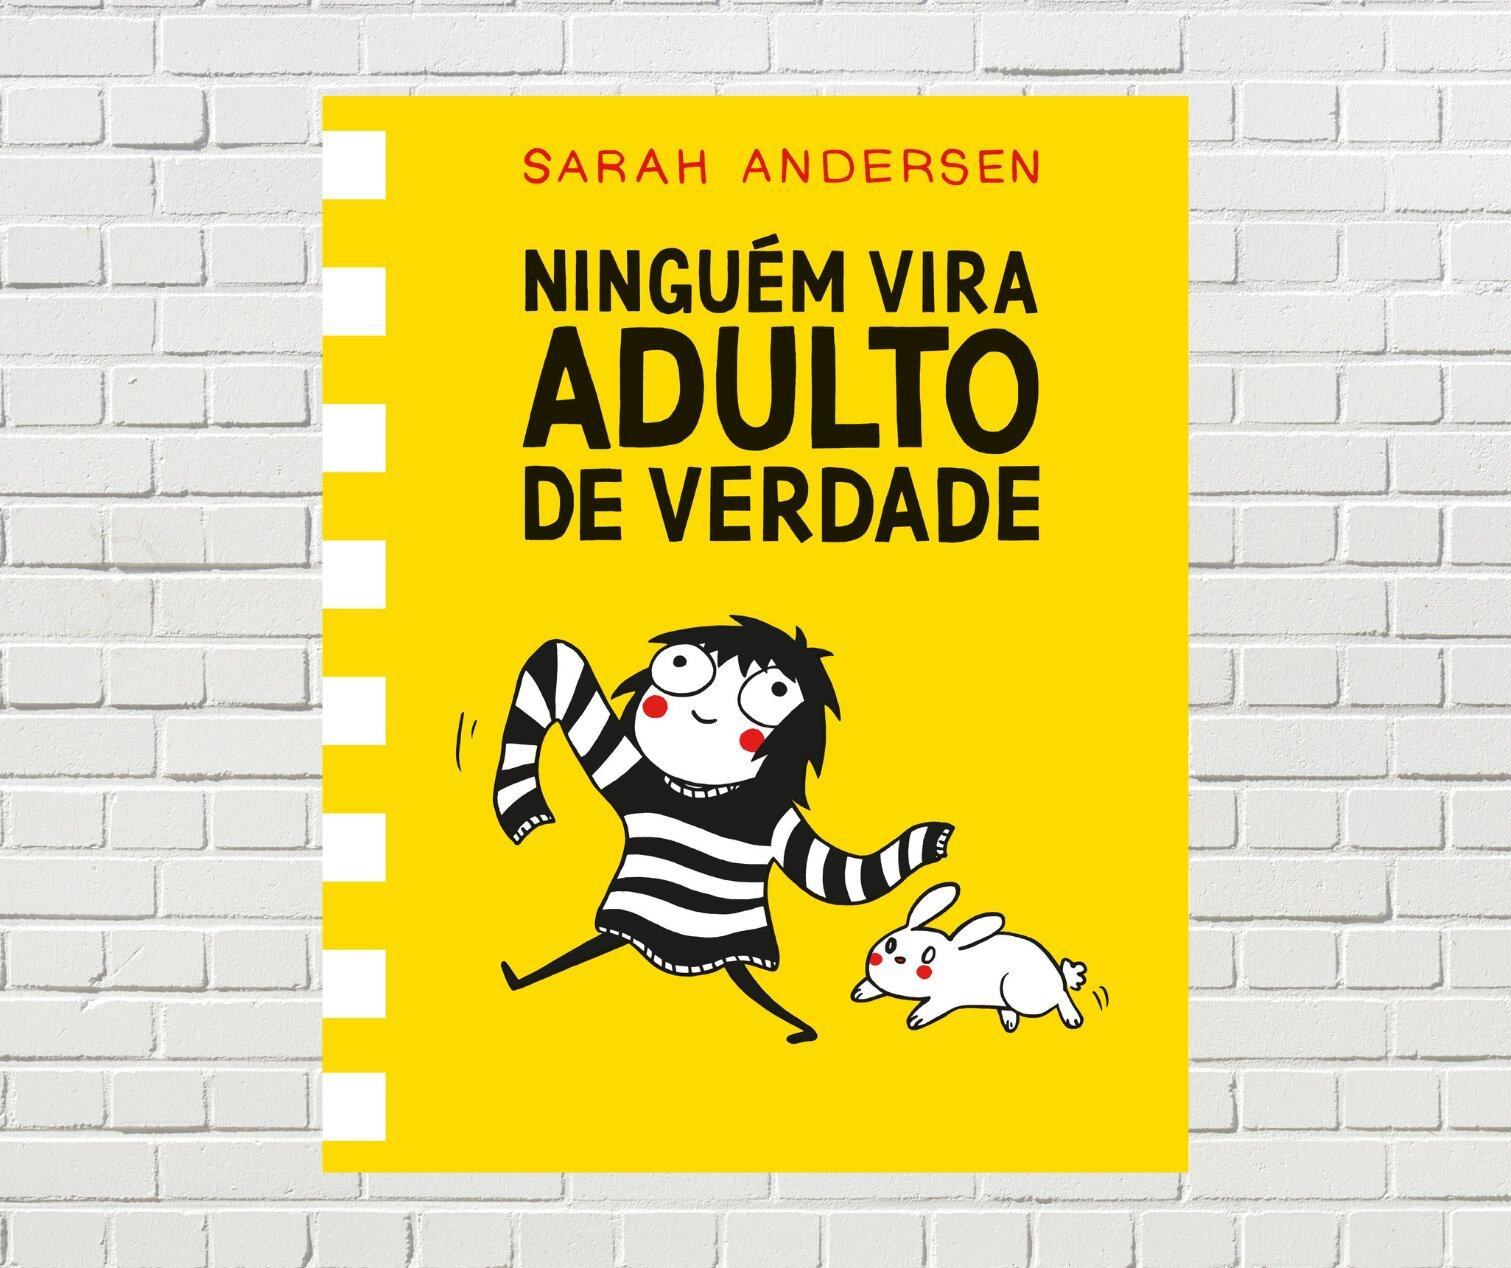 Resenha: Ninguém Vira Adulto de Verdade, de Sarah Andersen